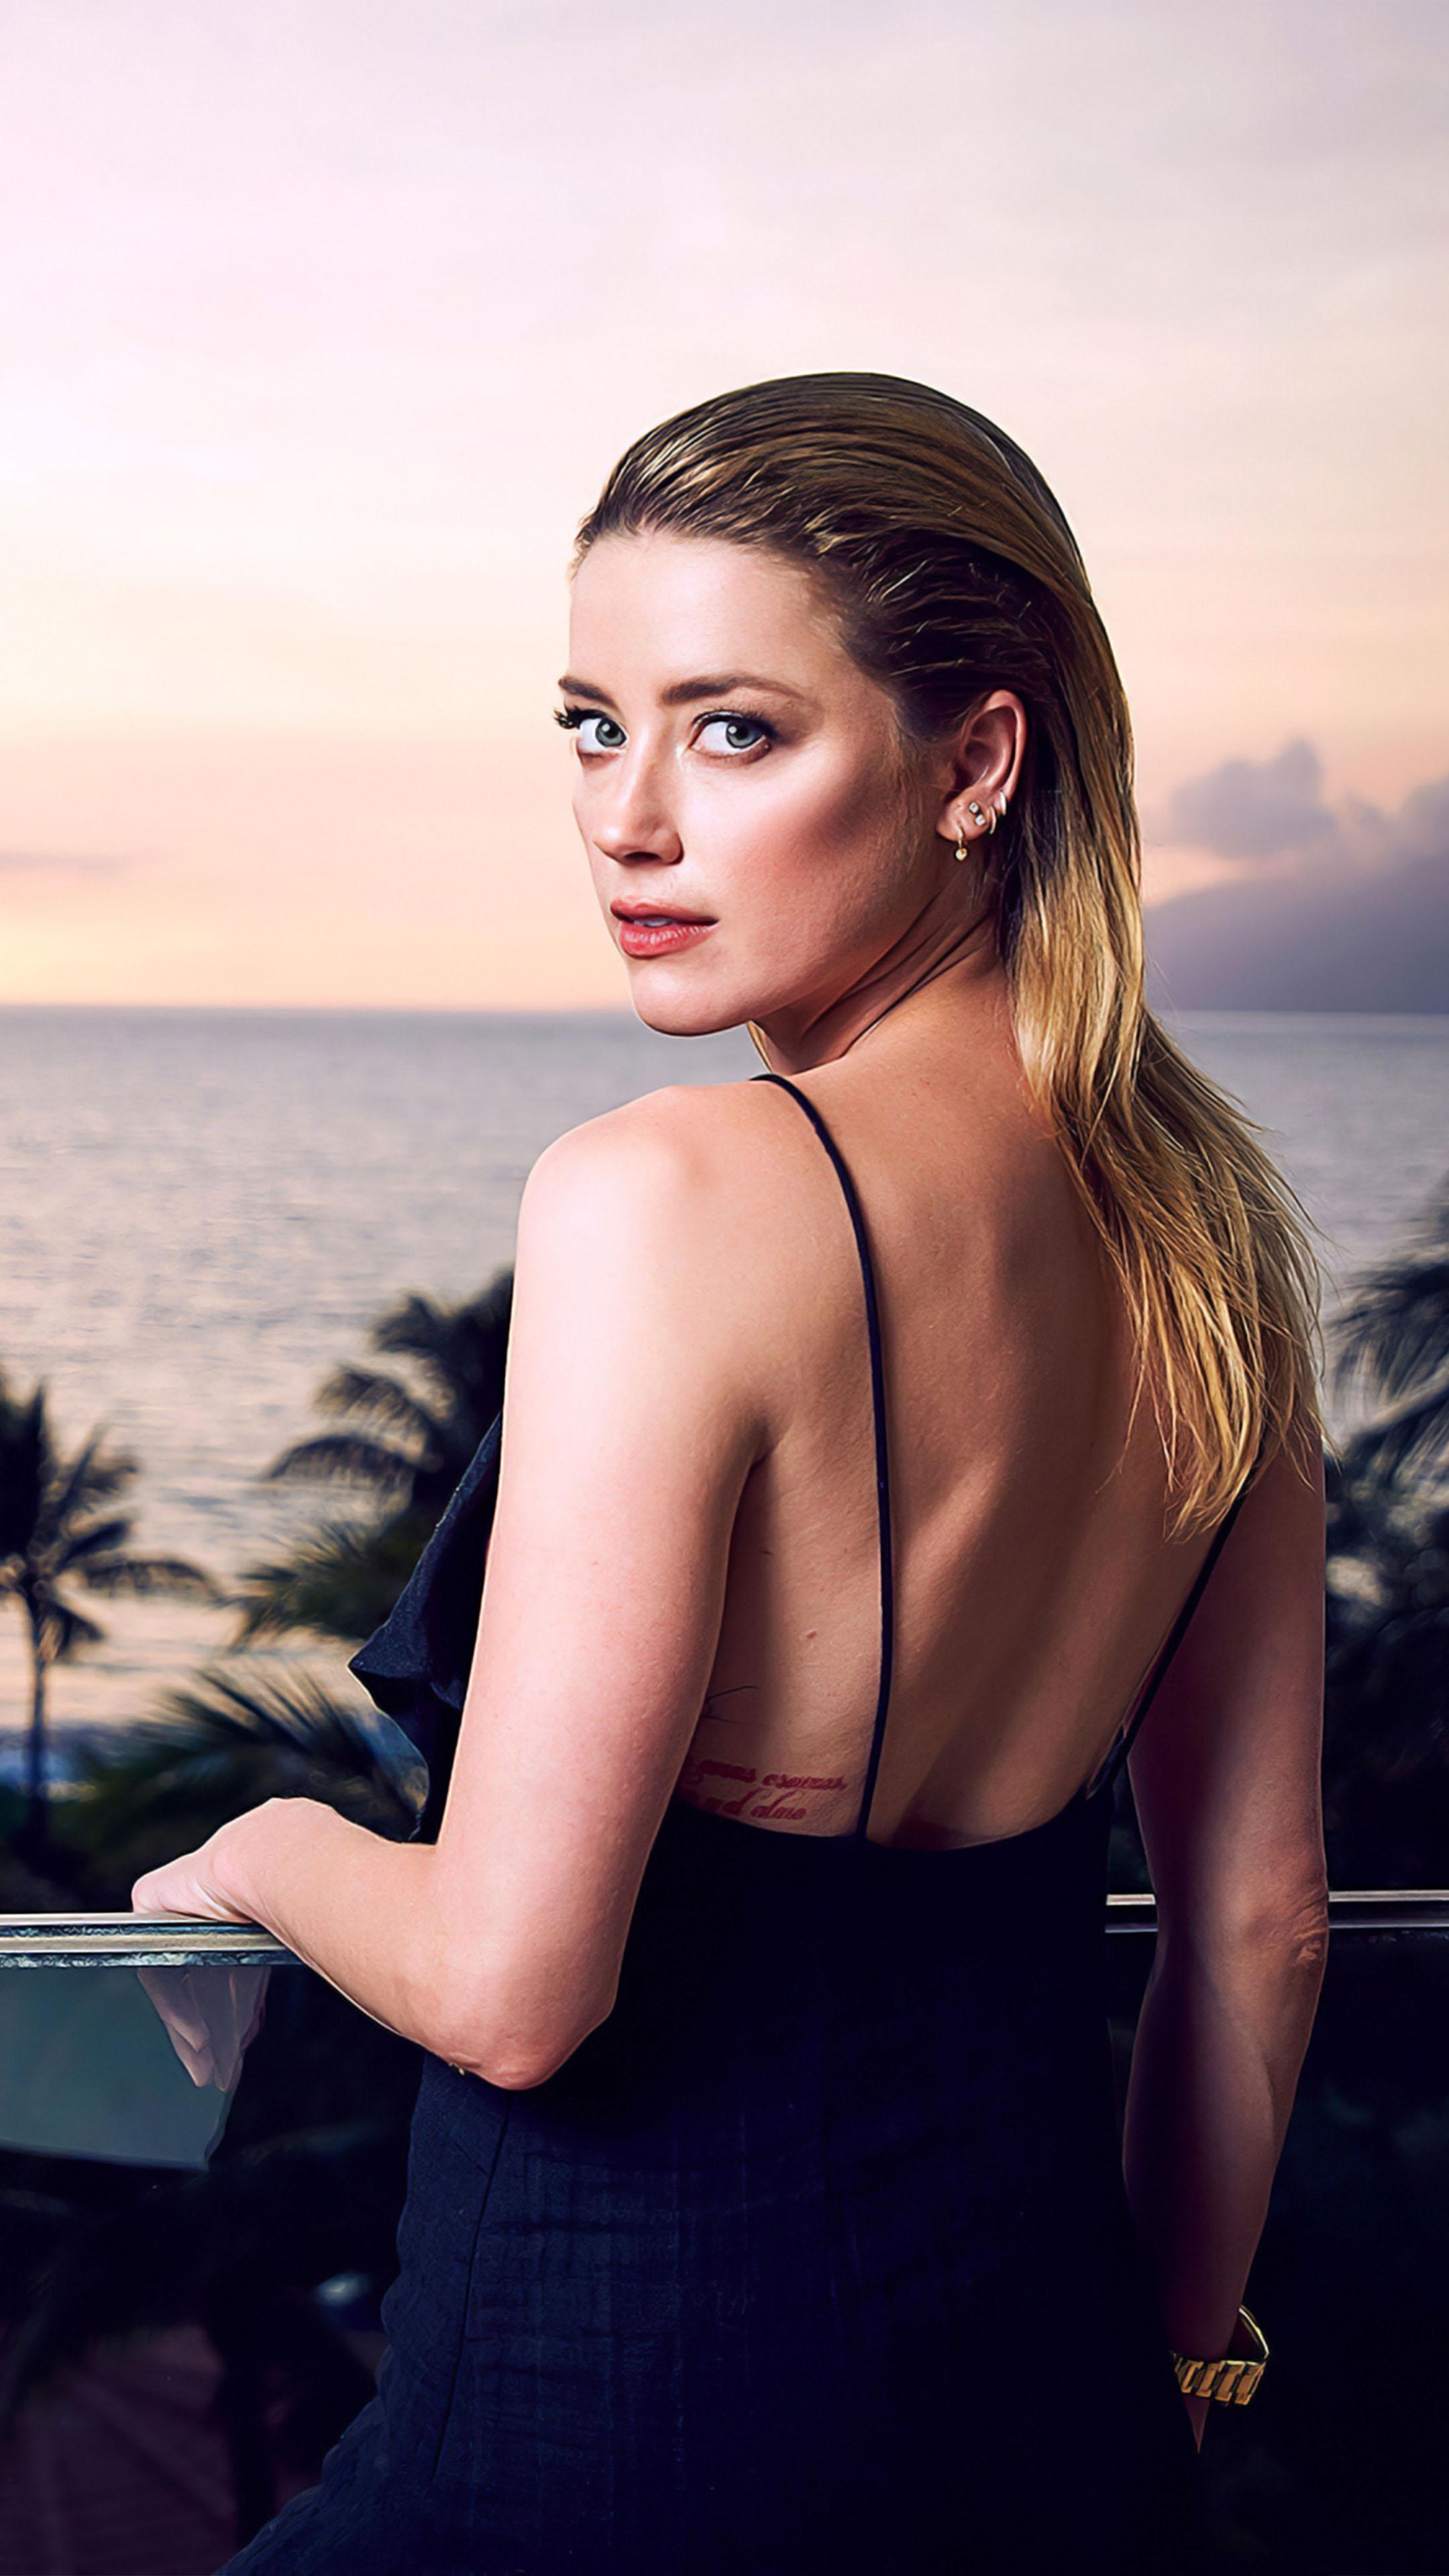 Amber Heard Maui Film Festival 2019 Free 4k Ultra Hd Mobile Wallpaper